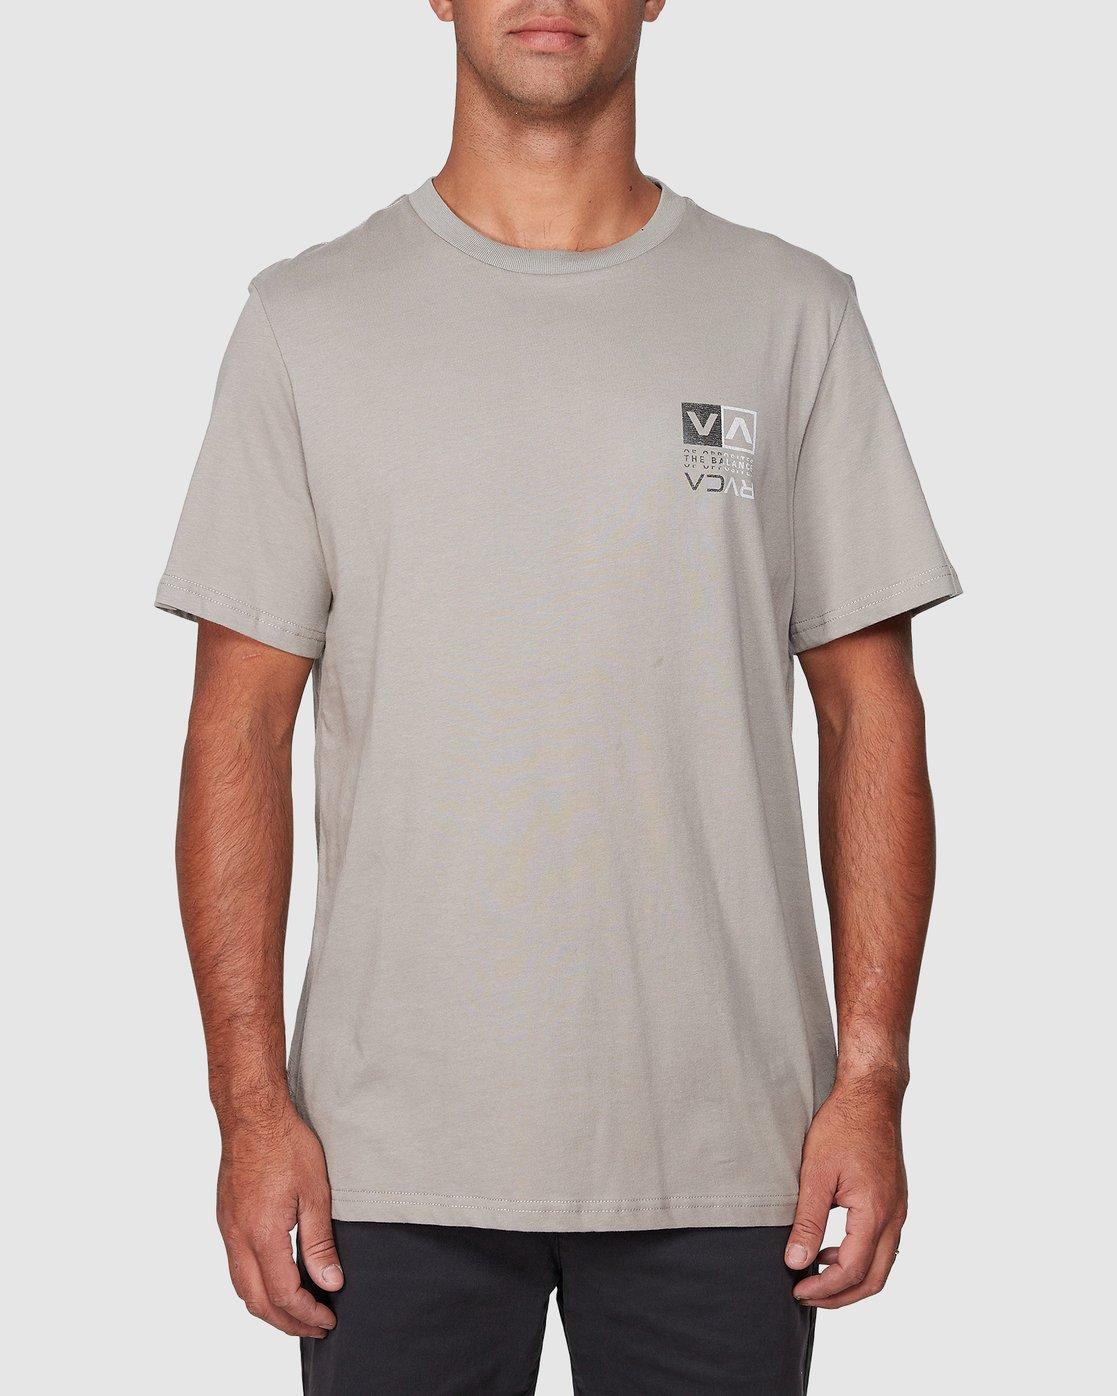 1 RVCA Split Short Sleeve Tee Multicolor R107045 RVCA